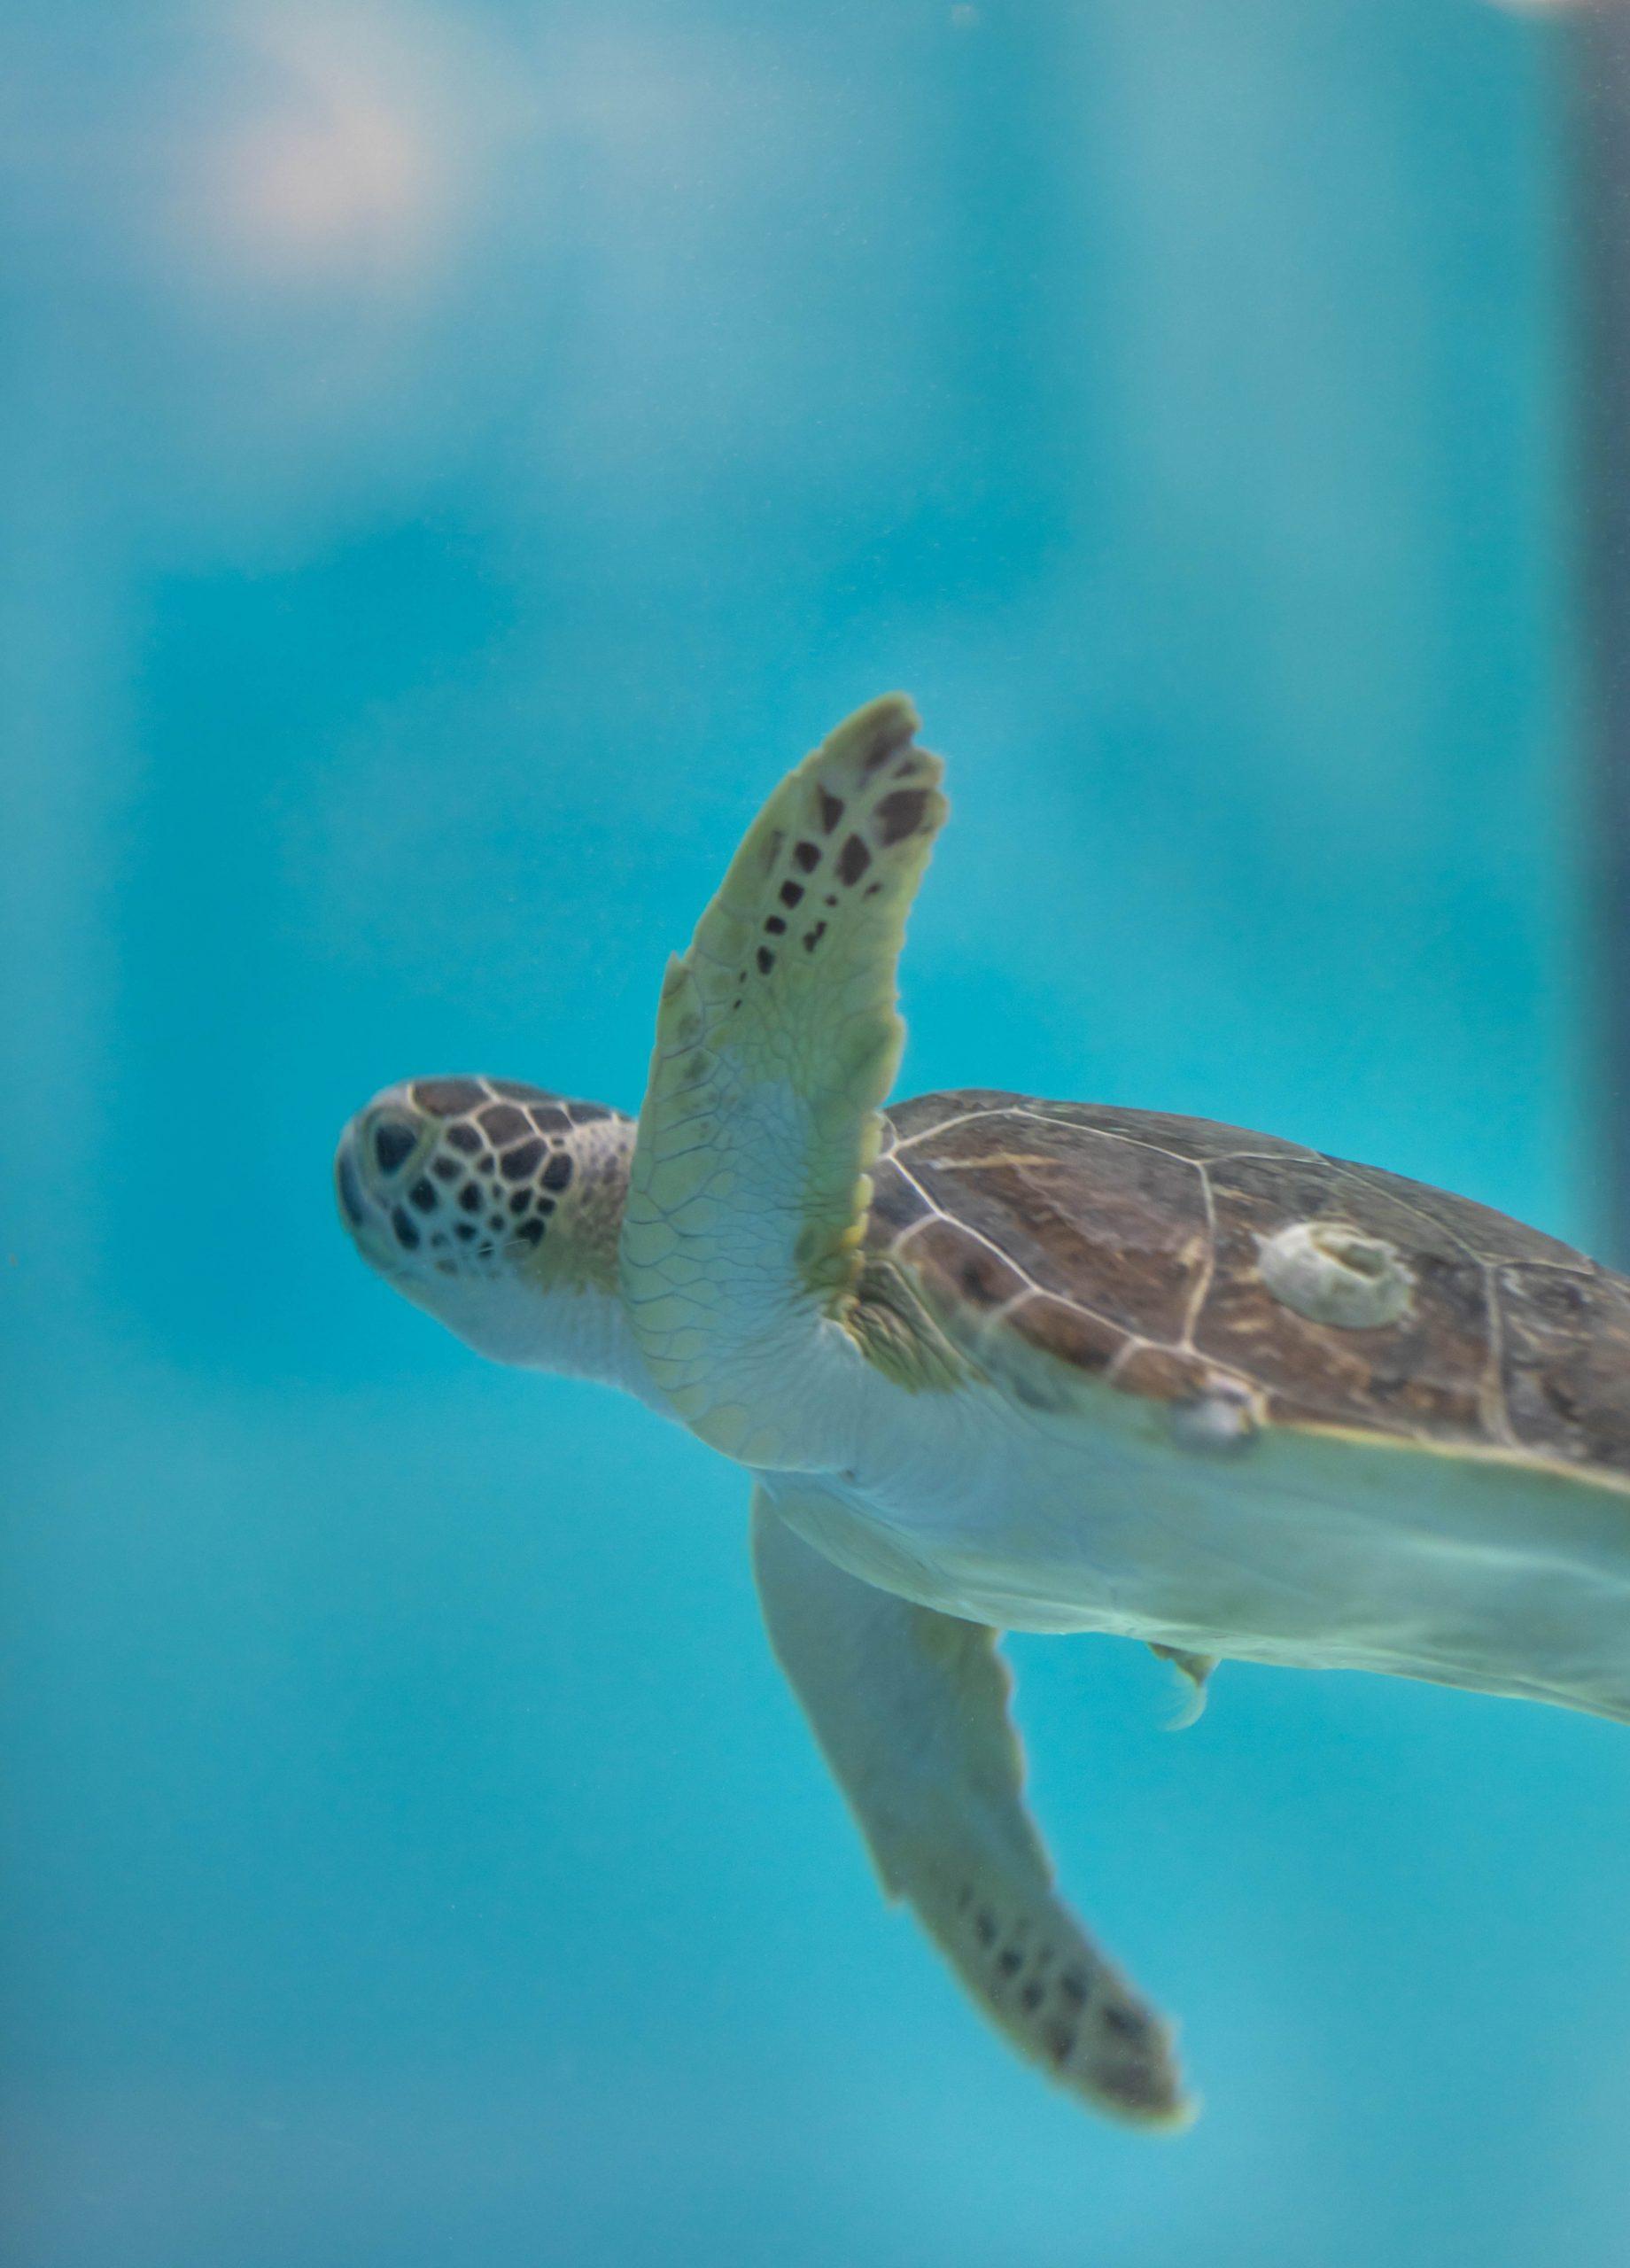 The South Carolina Aquarium & Sea Turtle Care Center Photographed by Luxury Travel Writer Annie Fairfax